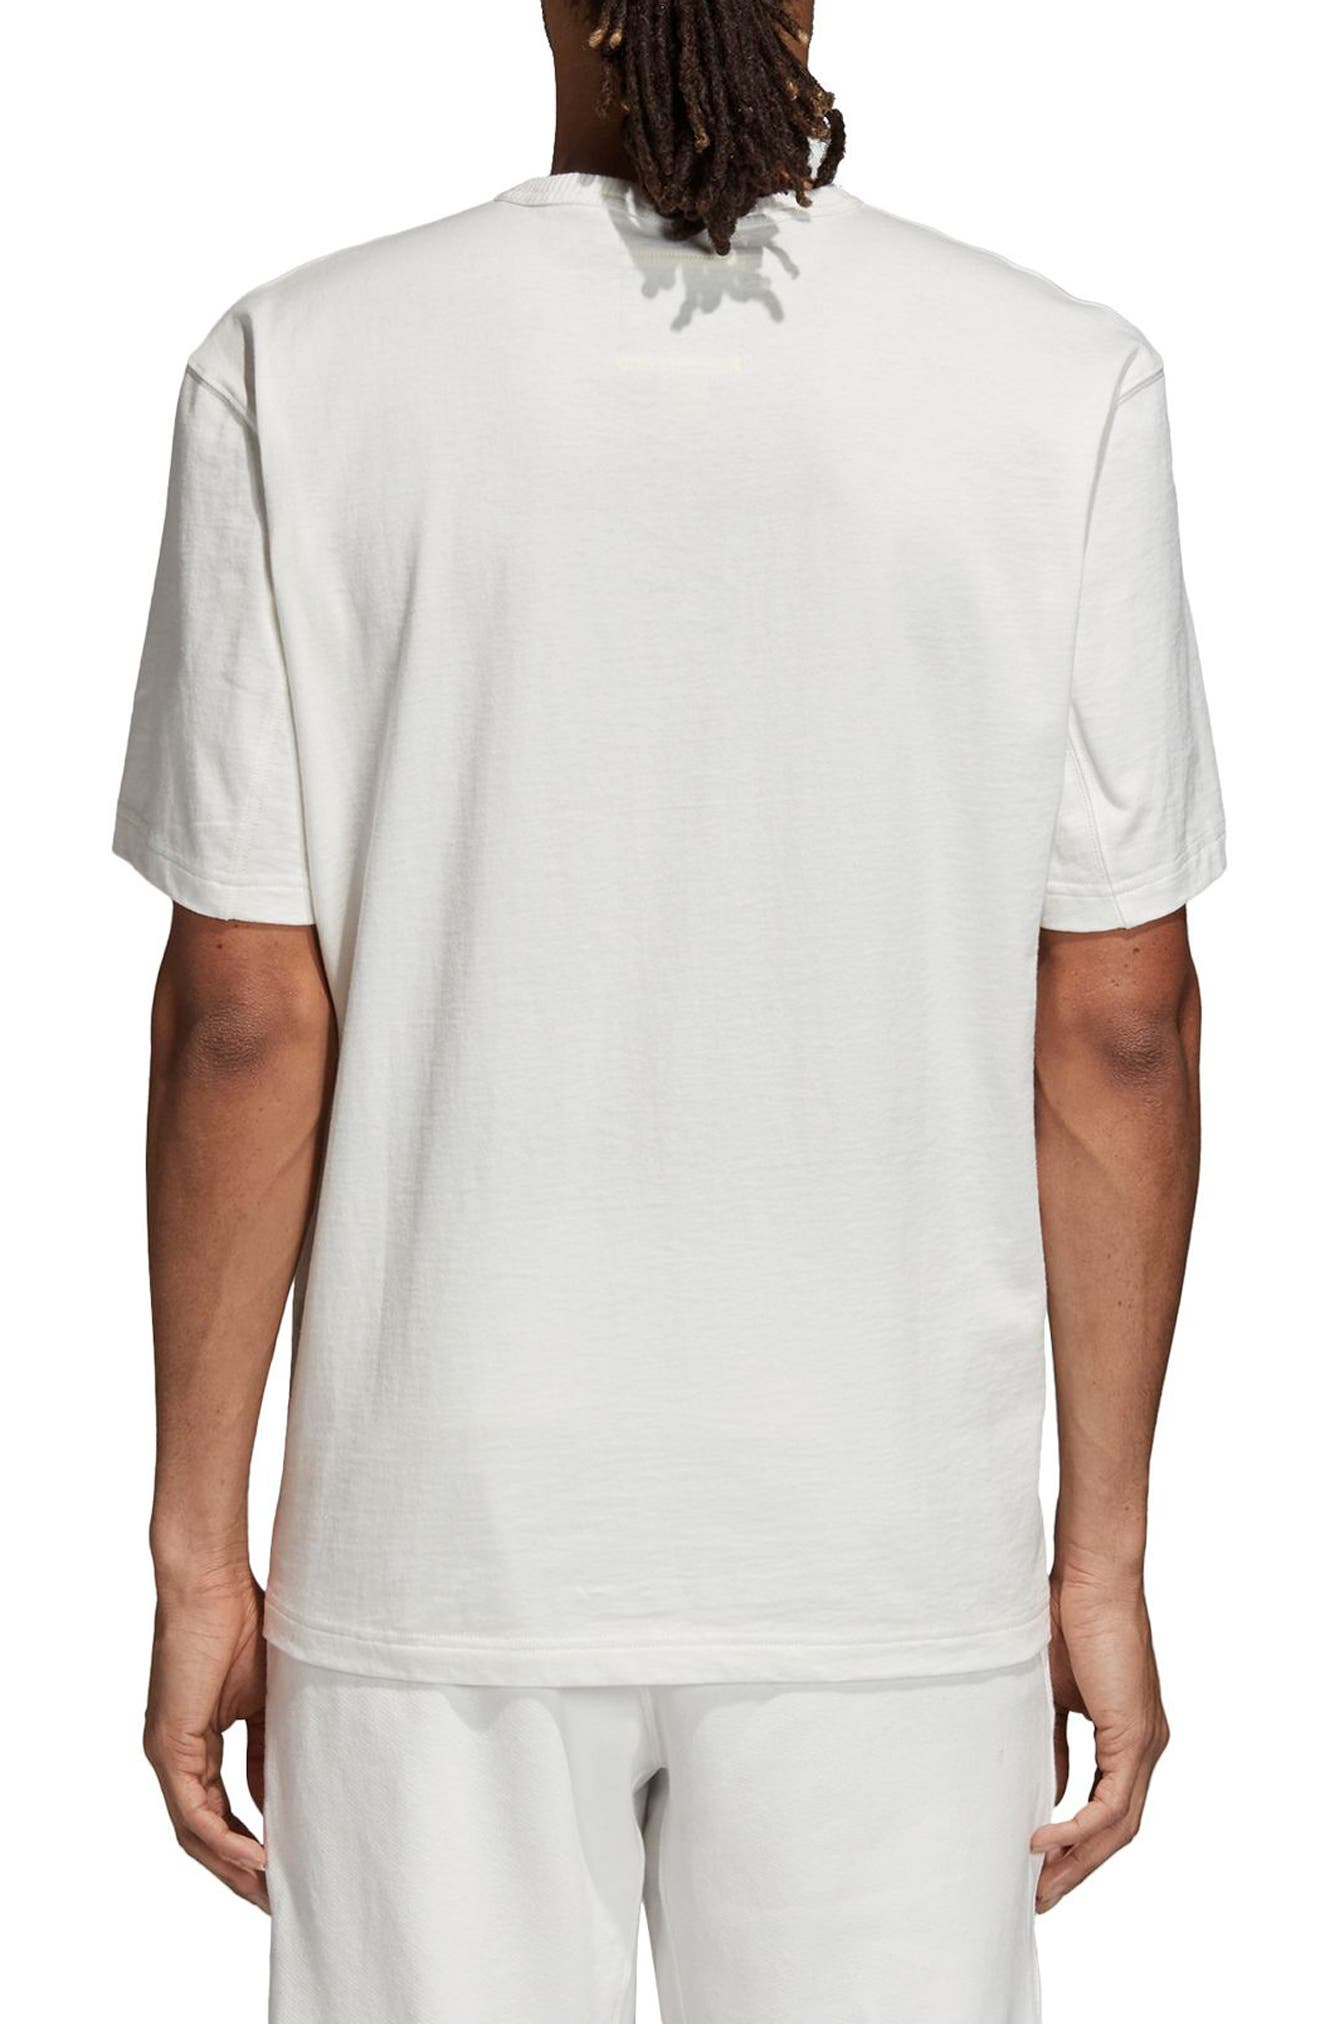 Kaval T-Shirt,                             Alternate thumbnail 2, color,                             CLOUD WHITE